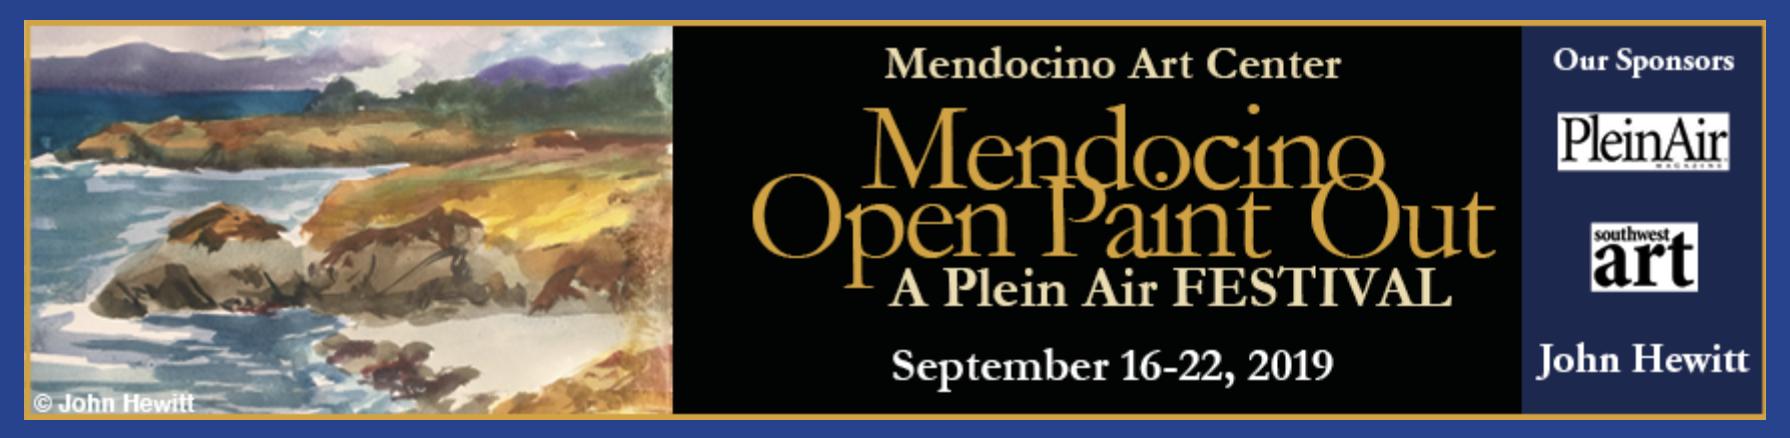 Mendocino Plein Air - September 16 - 22nd, 2019